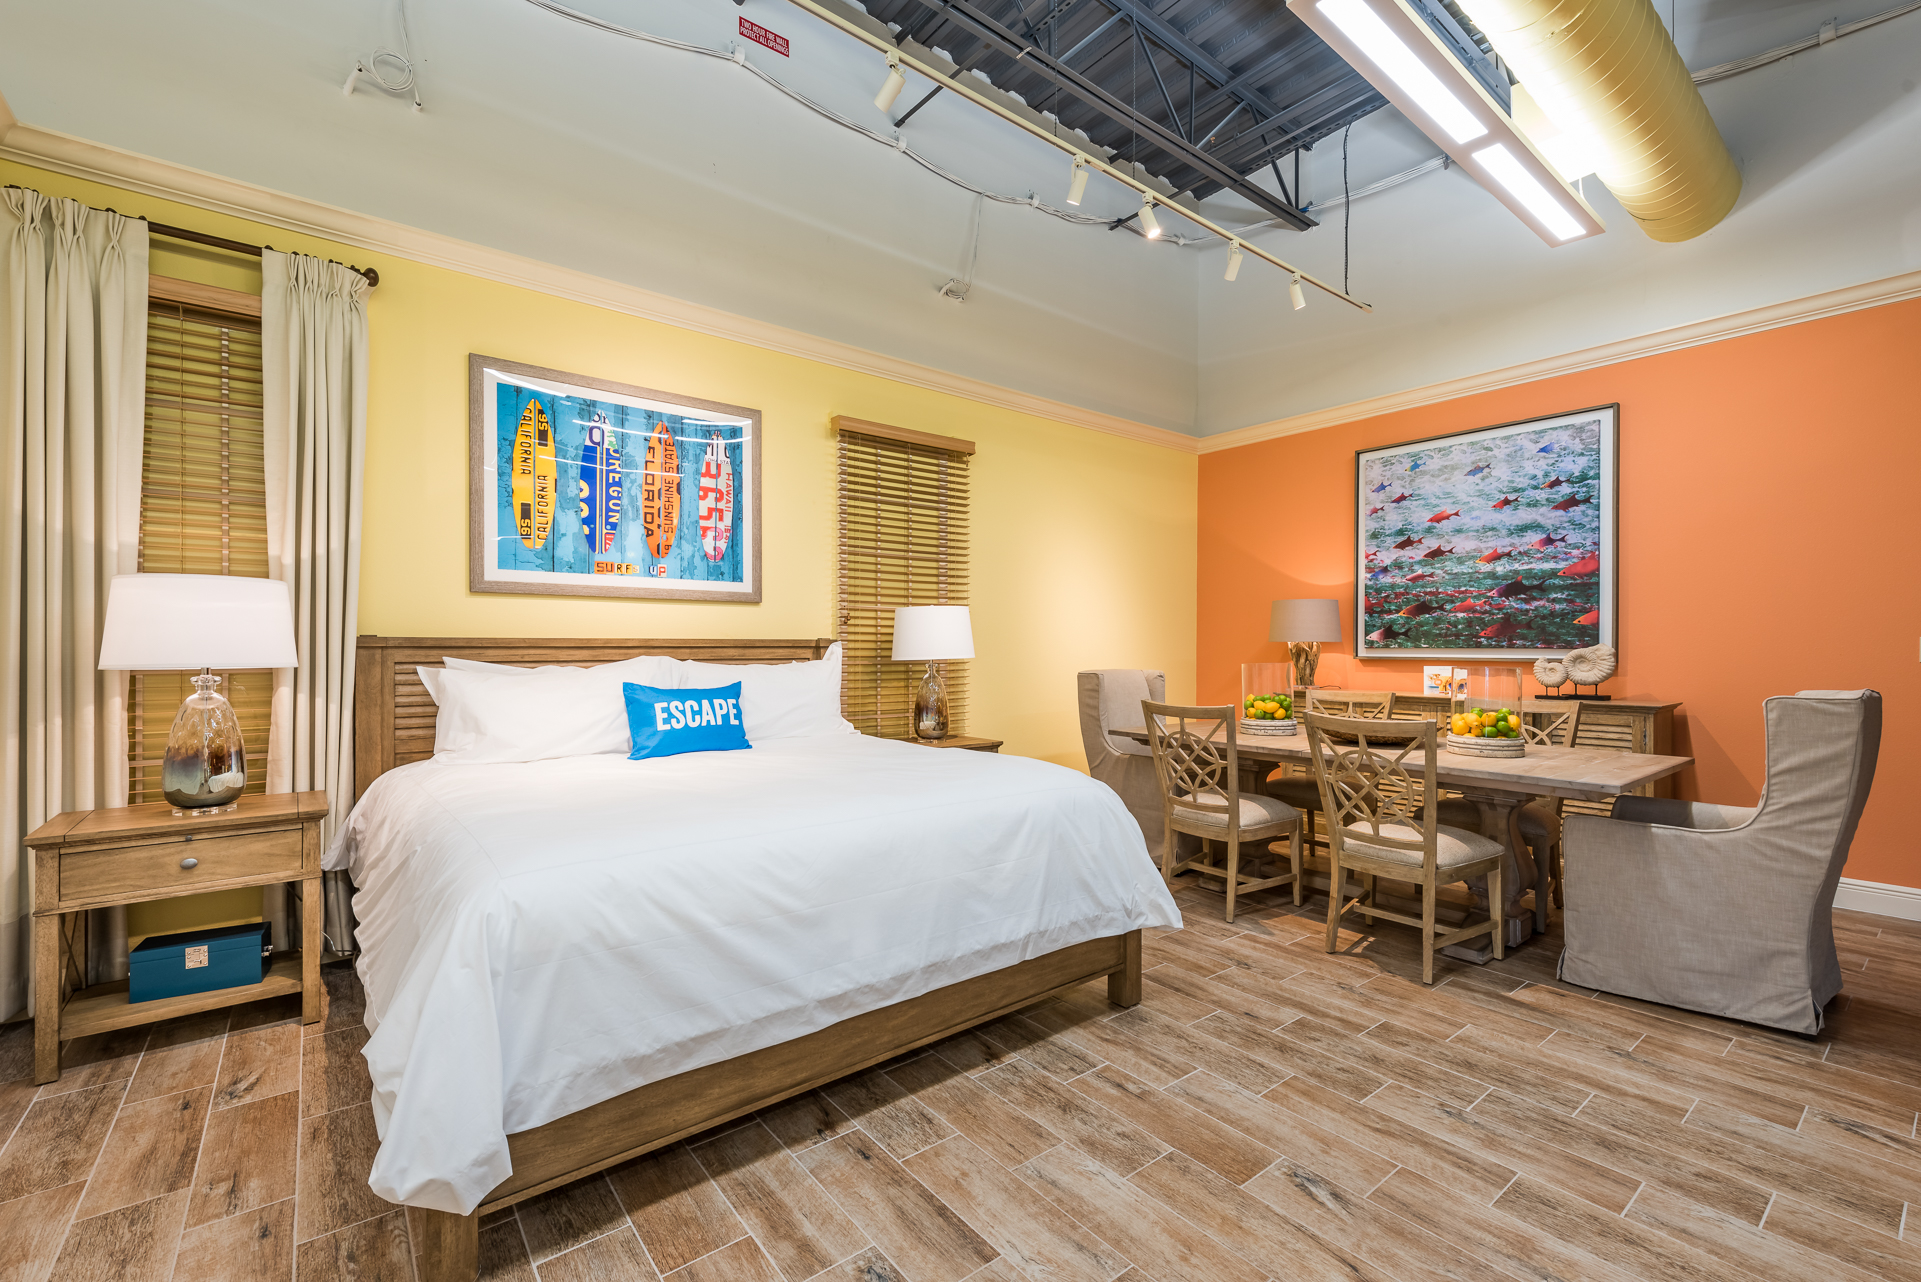 Margaritaville Resort Orlando Partners With Ethan Allen